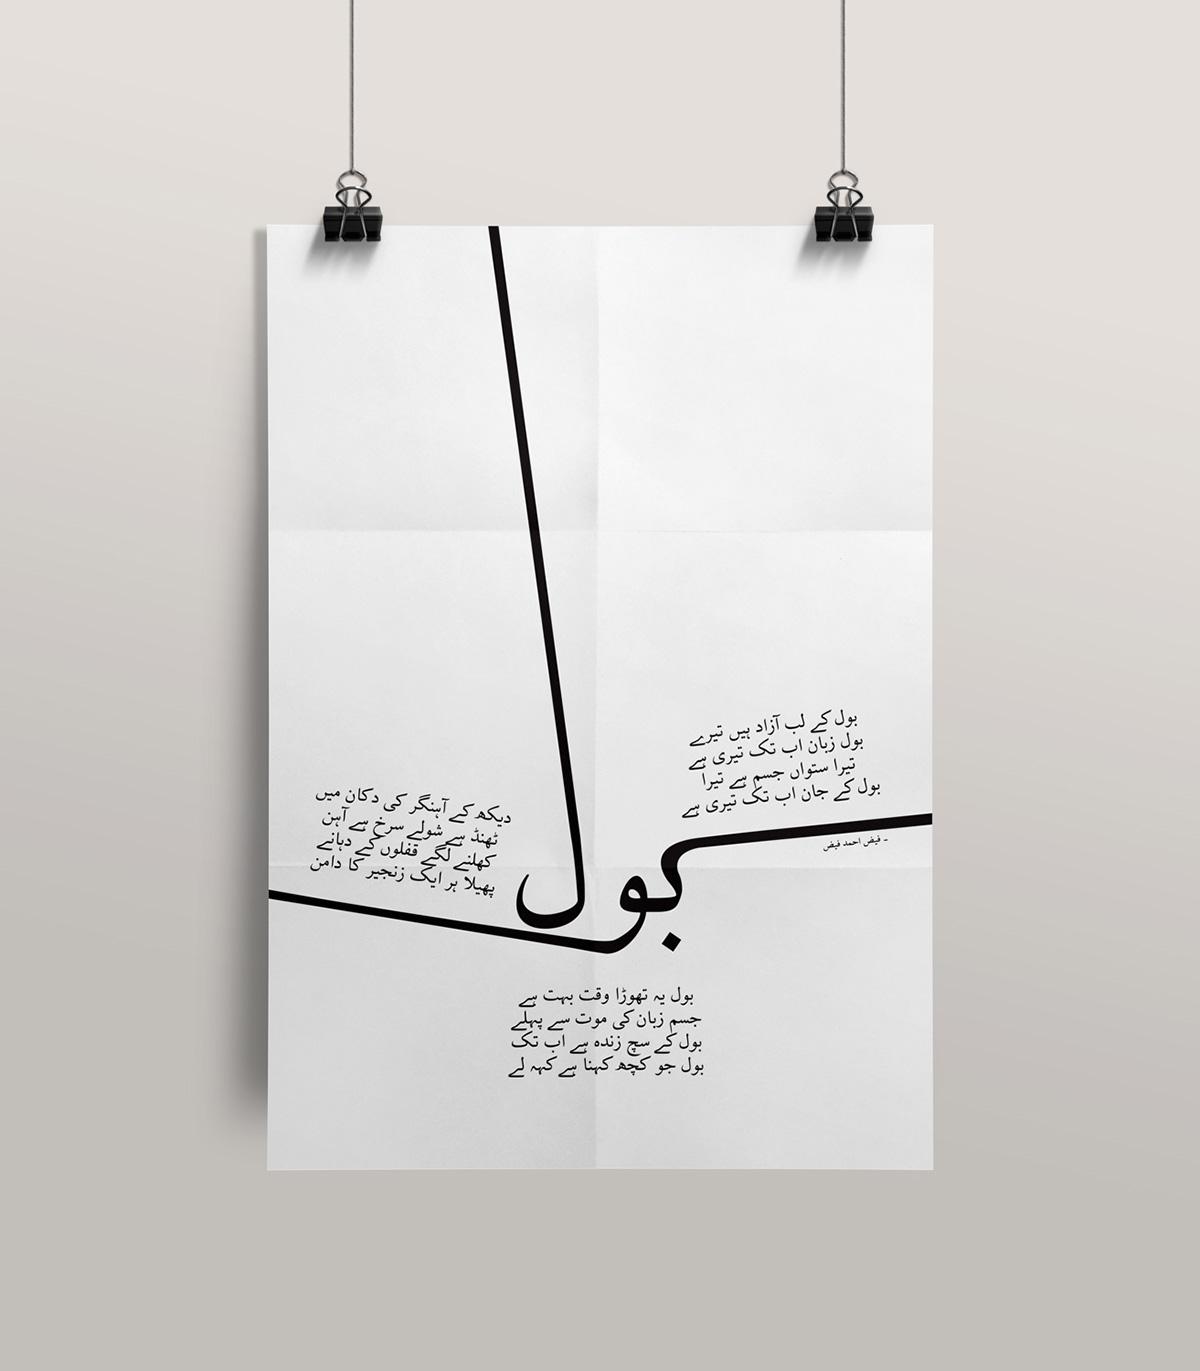 urdu arabic type swash Handlettering poem Poetry  poster design India bangalore Ps25Under25 #Ps25Under25